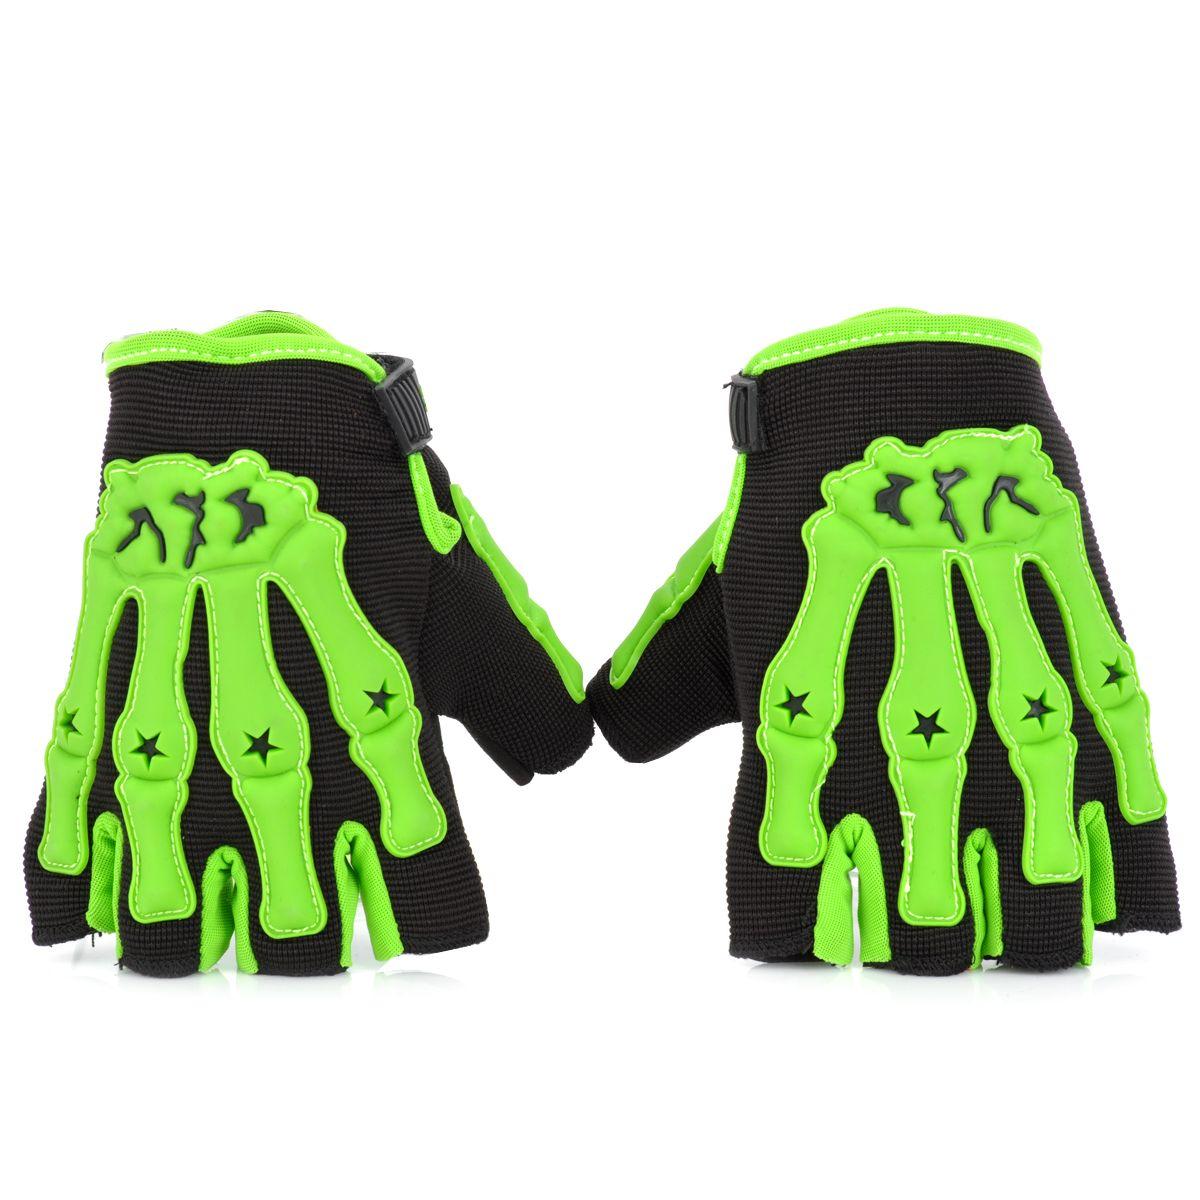 Motorcycle gloves half finger - Cool Design Outdoor Sport Gloves Skull Style Half Fingers Anti Slip Motorcycle Racing Gloves